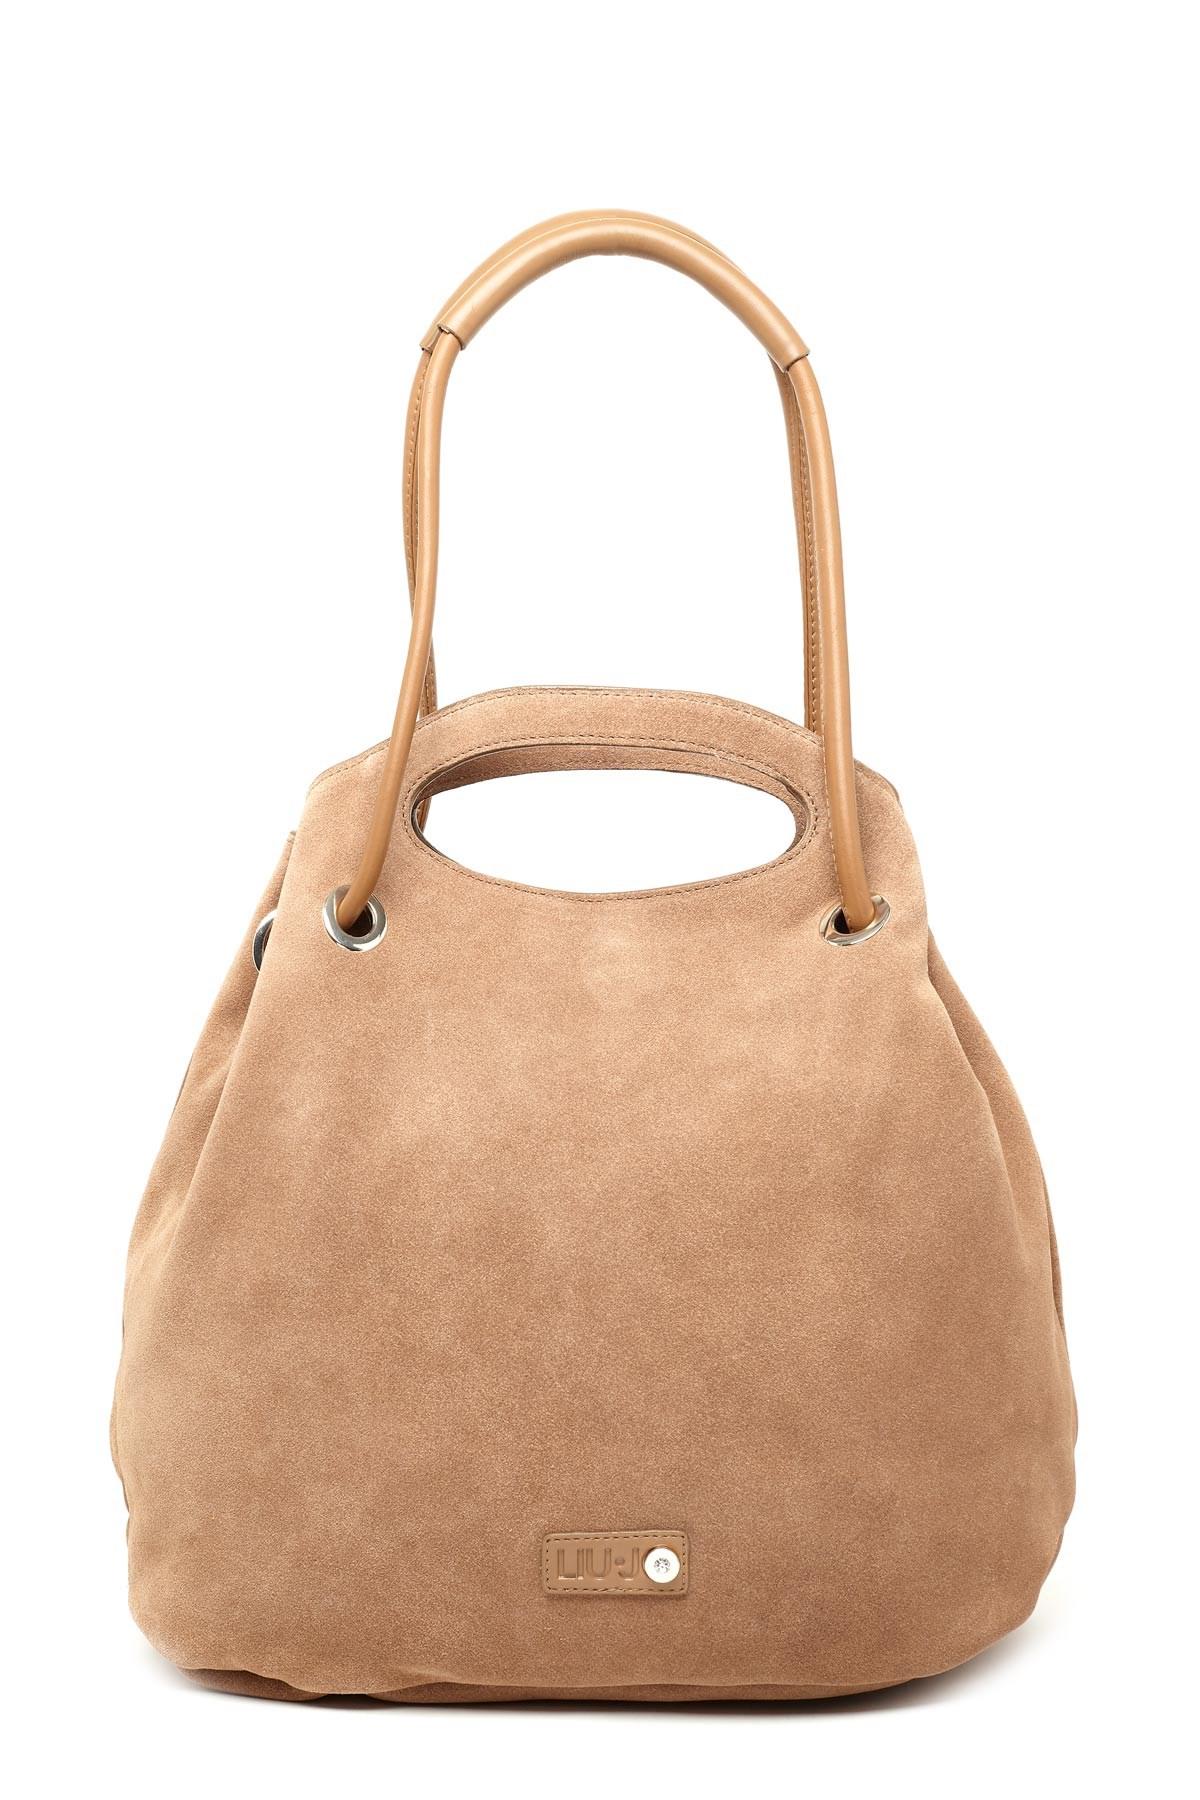 liu jo  Carina  shoulder bag available on julian-fashion.com - 66998 4de080e9398